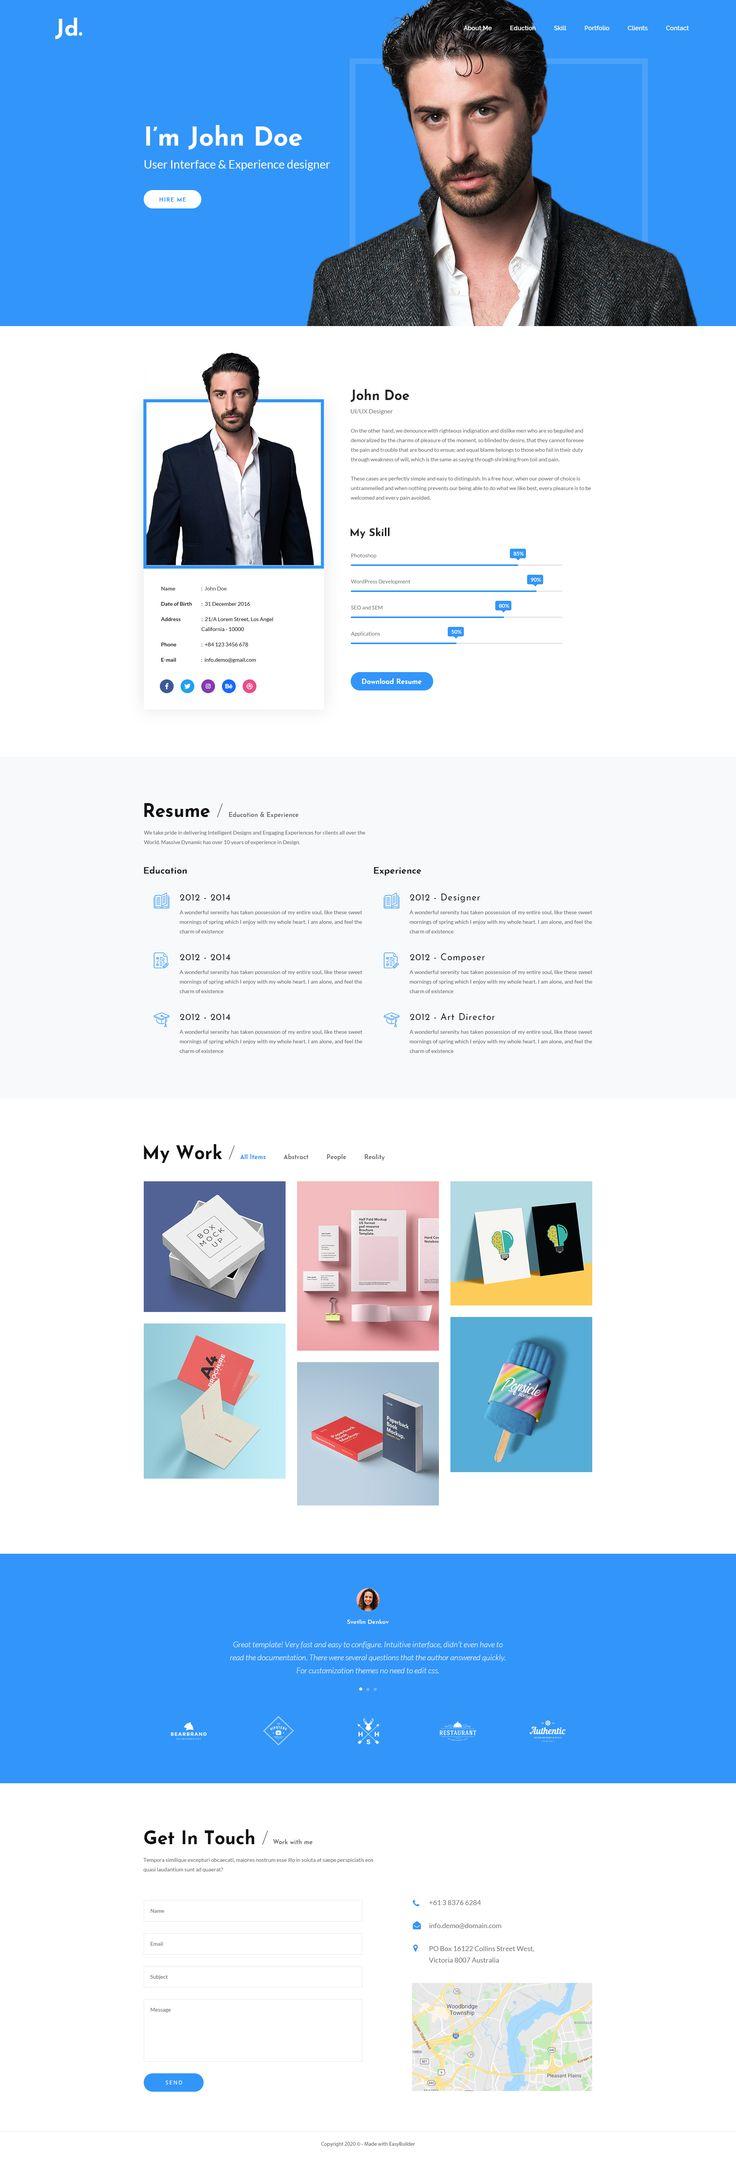 Free Resume Web Design PSD Template in 2020 Web design